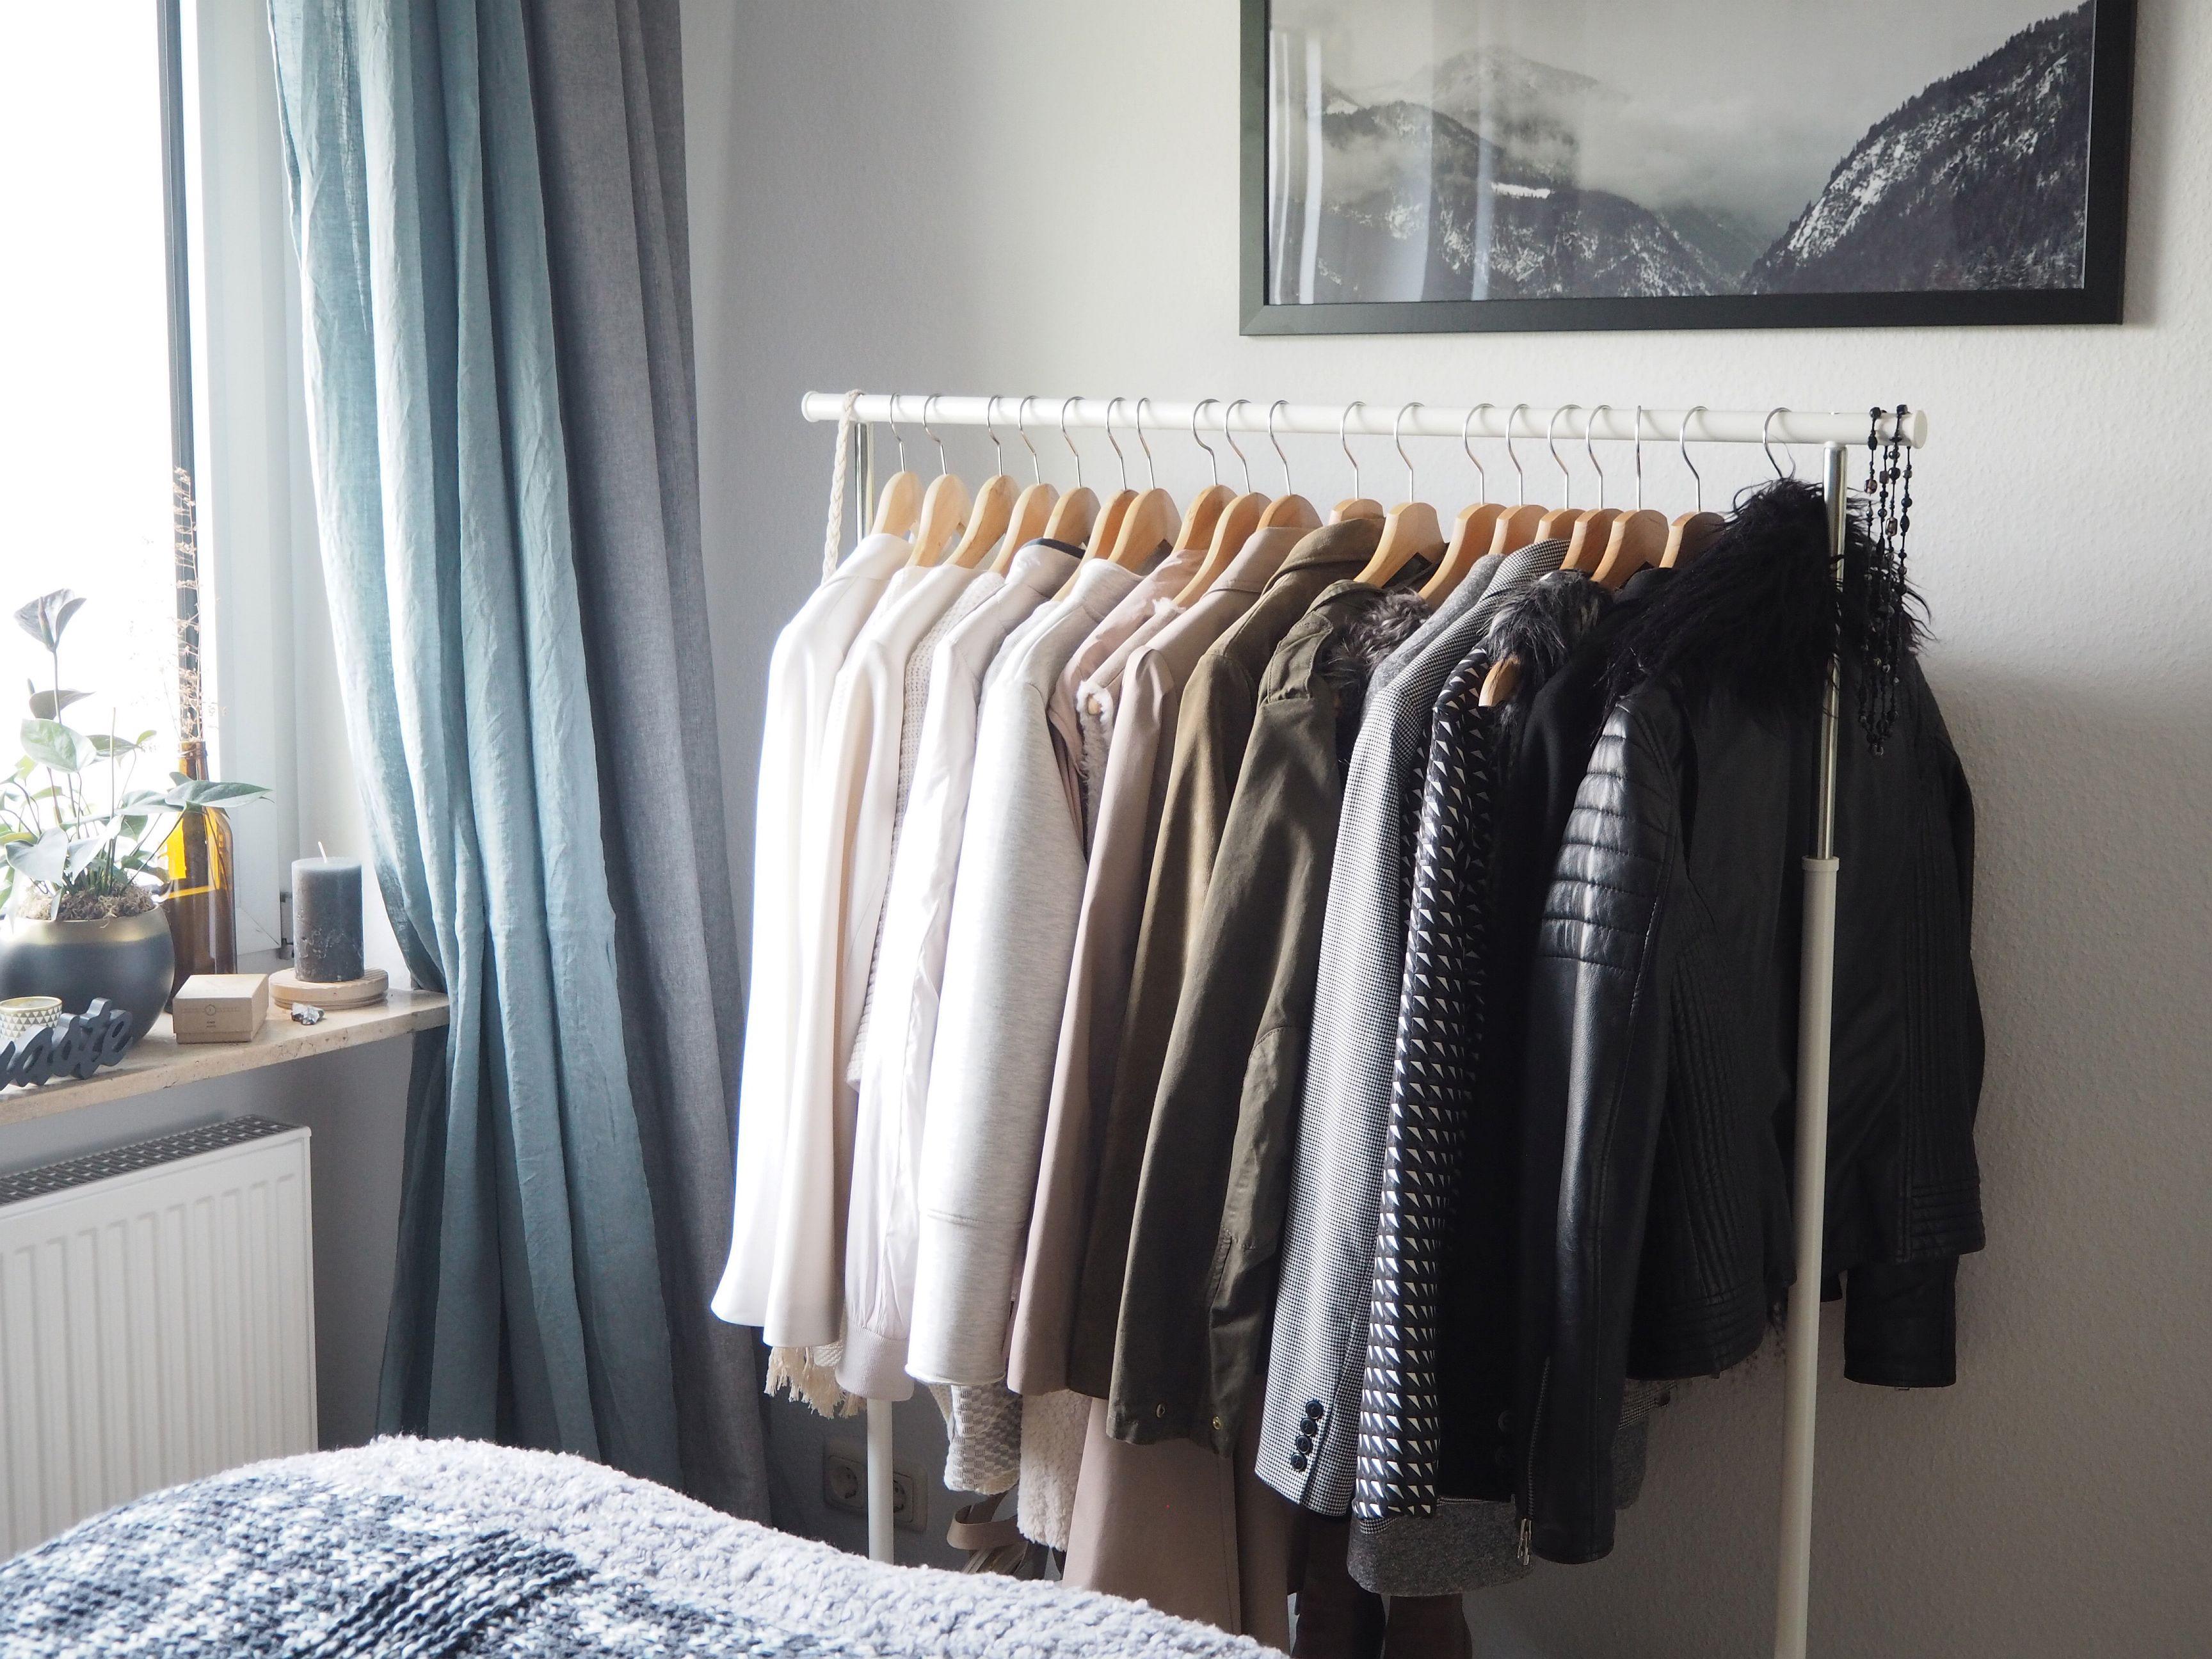 2018-06-skoen-och-kreativ-interior-schlafzimmer-wandgestaltung-pixers-gruen (3)